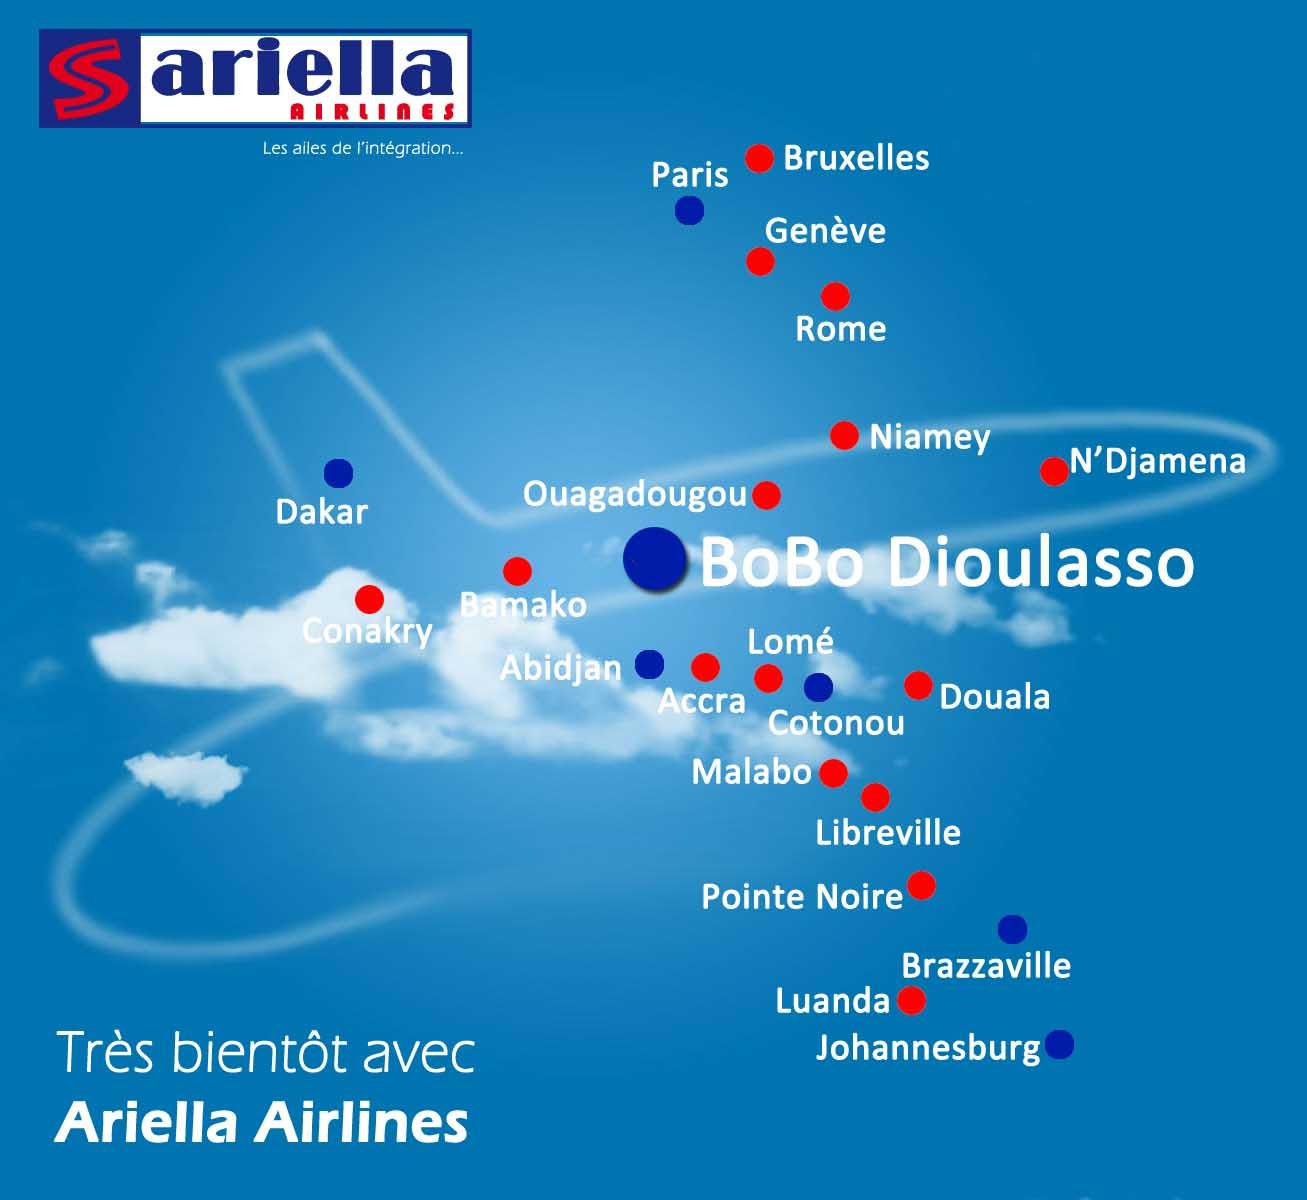 Ariella's planned network